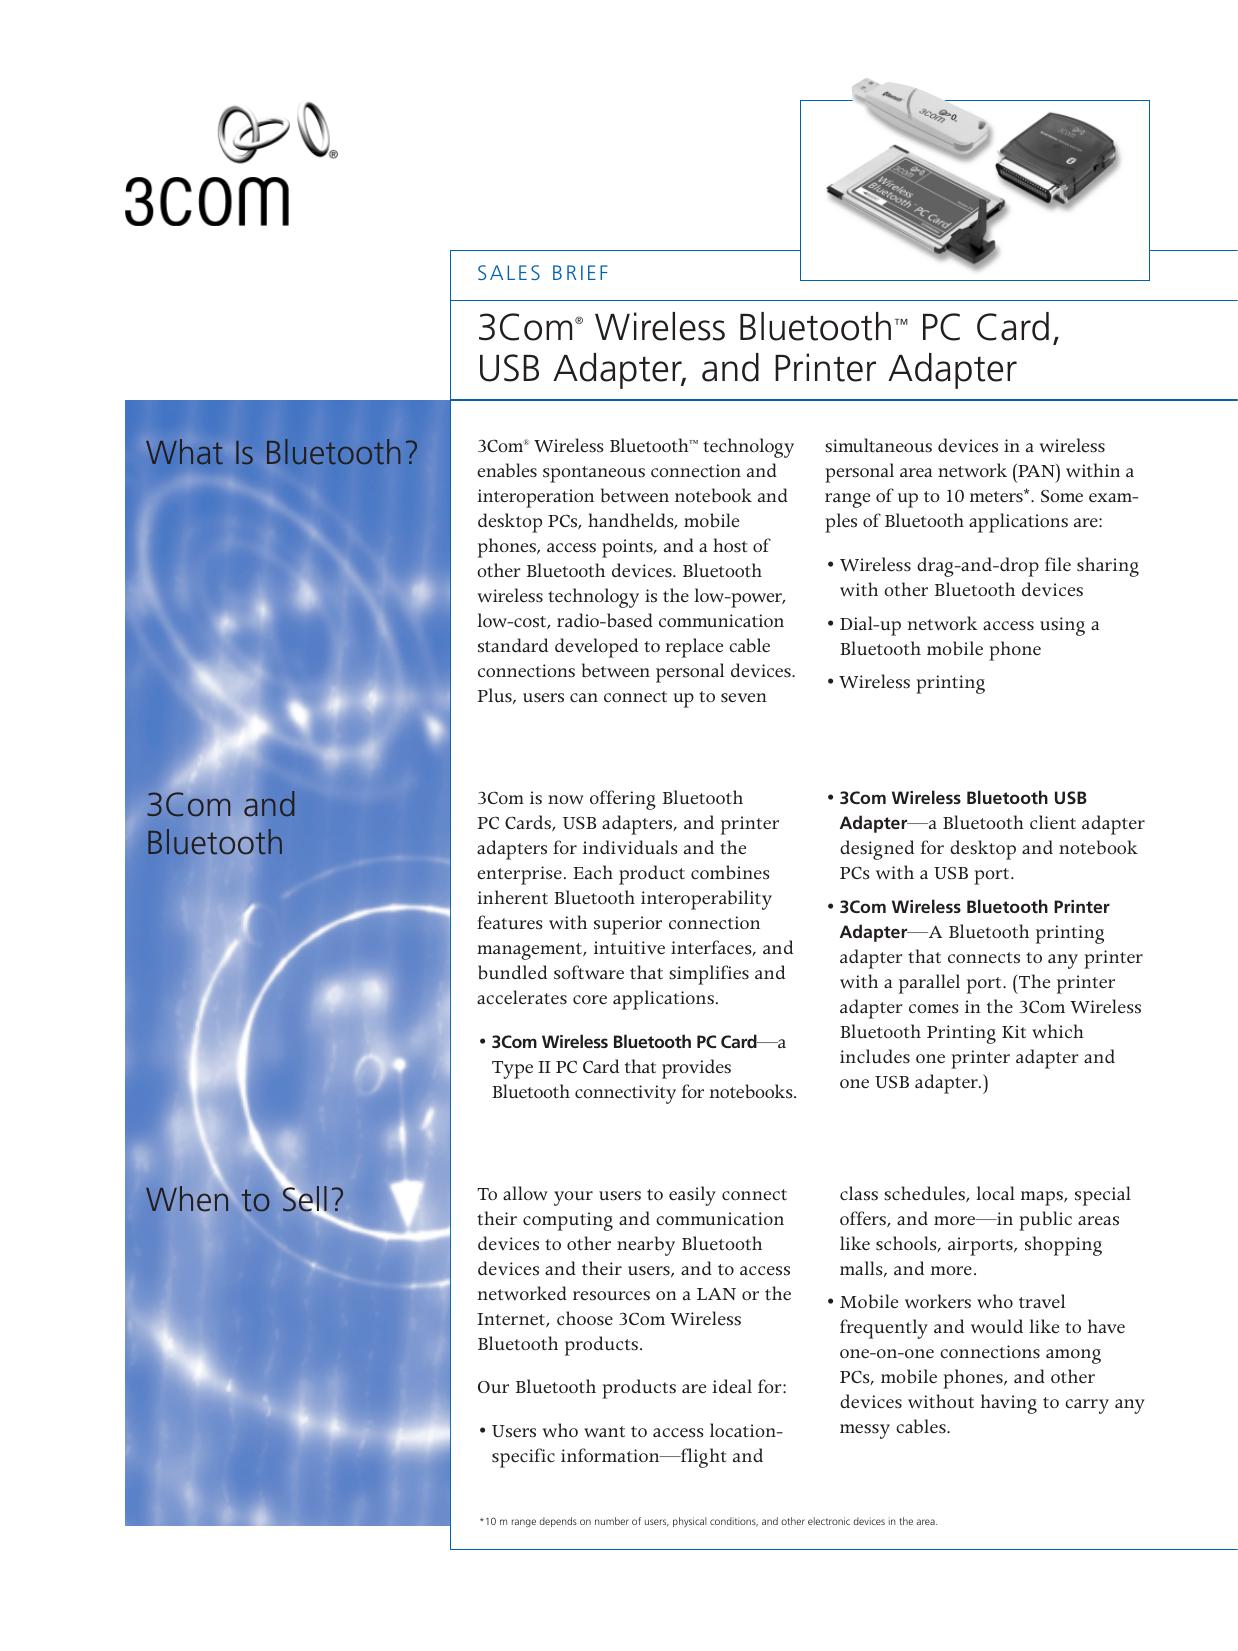 3Com® Wireless Bluetooth™ PC Card, USB Adapter, and Printer